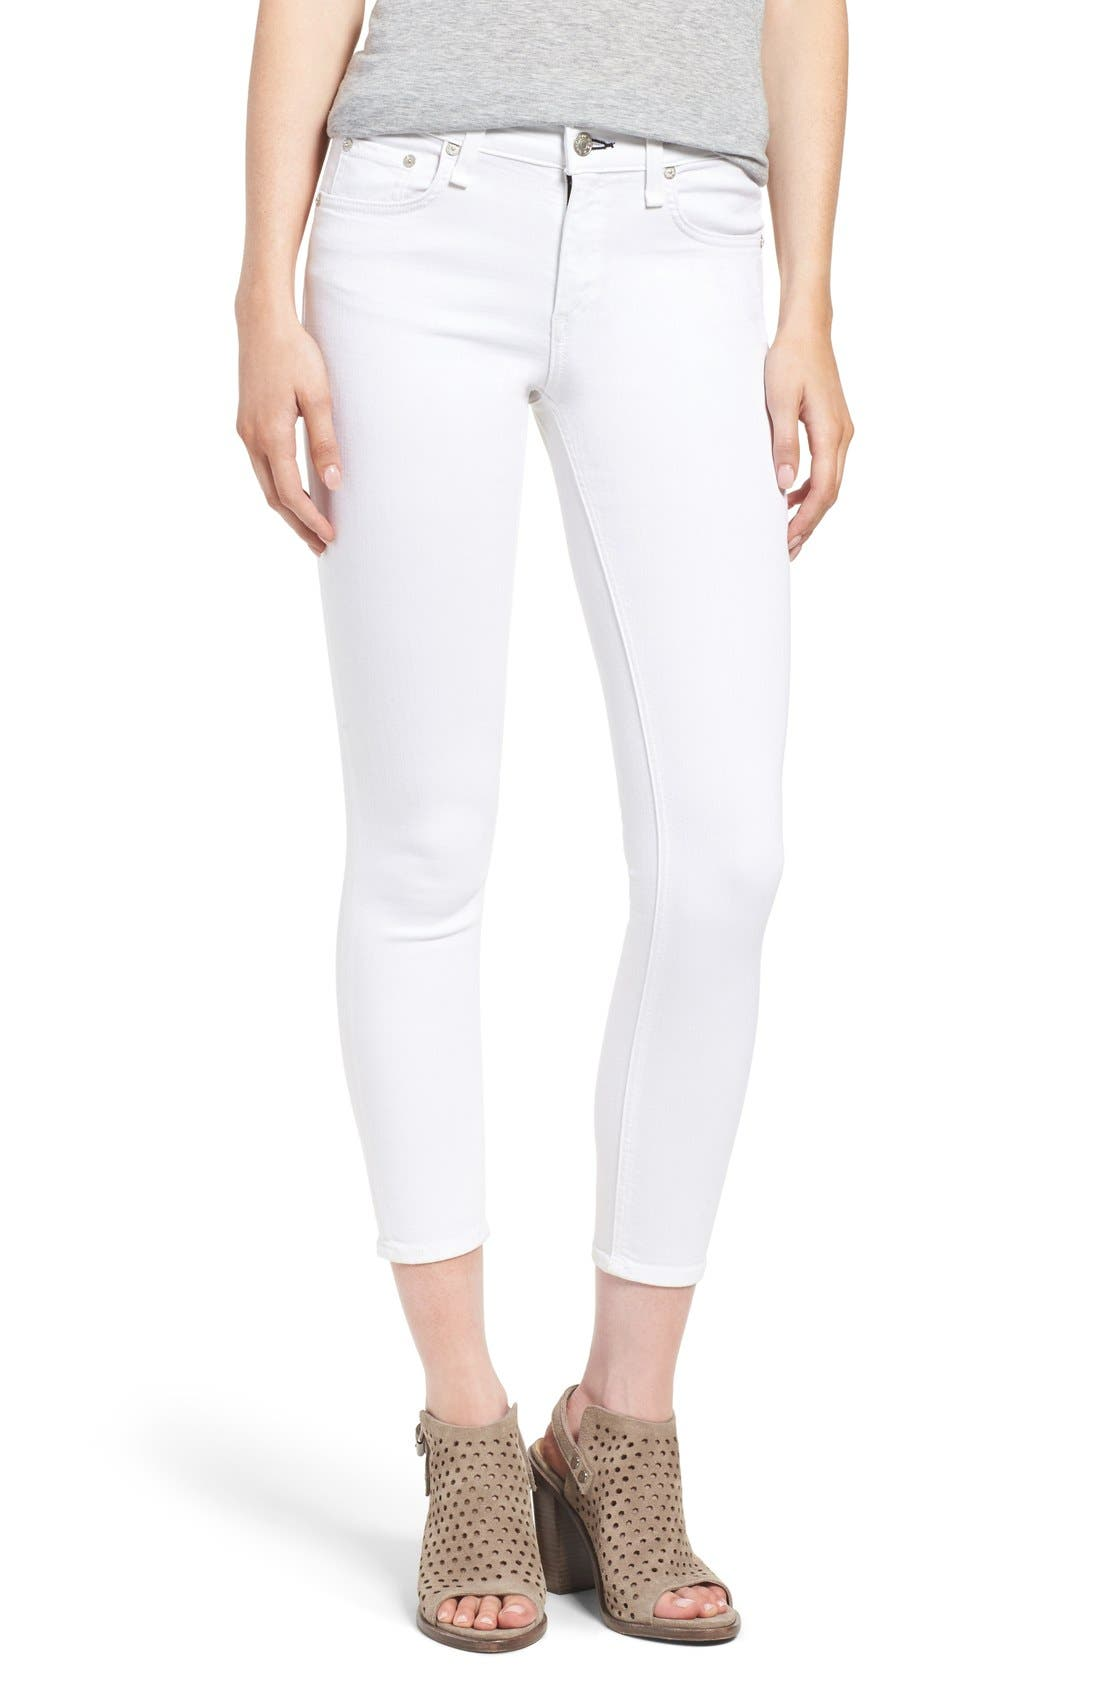 Main Image - rag & bone/JEAN 'Capri' Skinny Crop Jeans (Bright White)